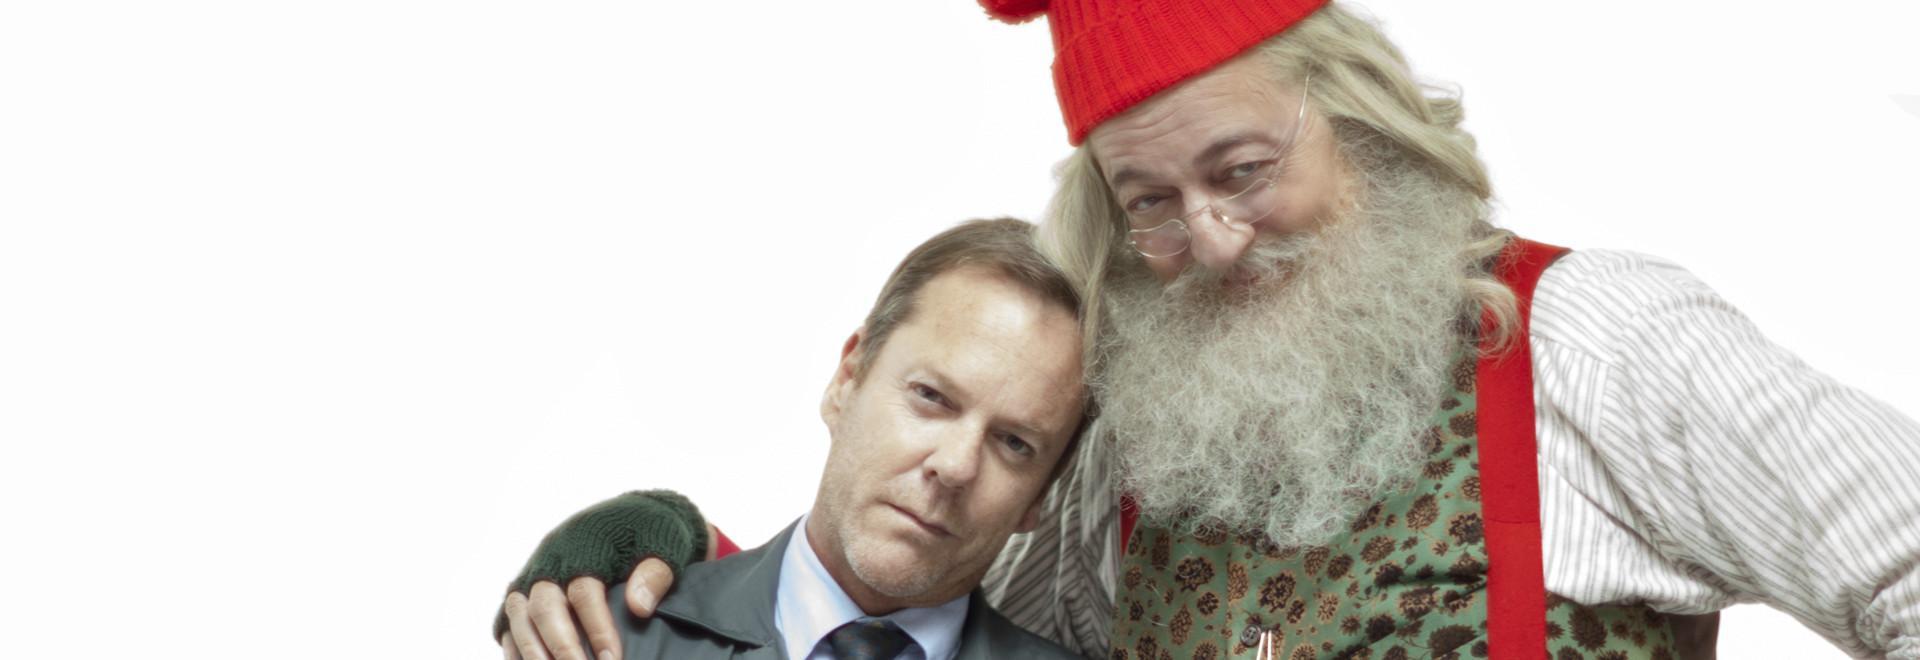 Babbo Natale deve morire